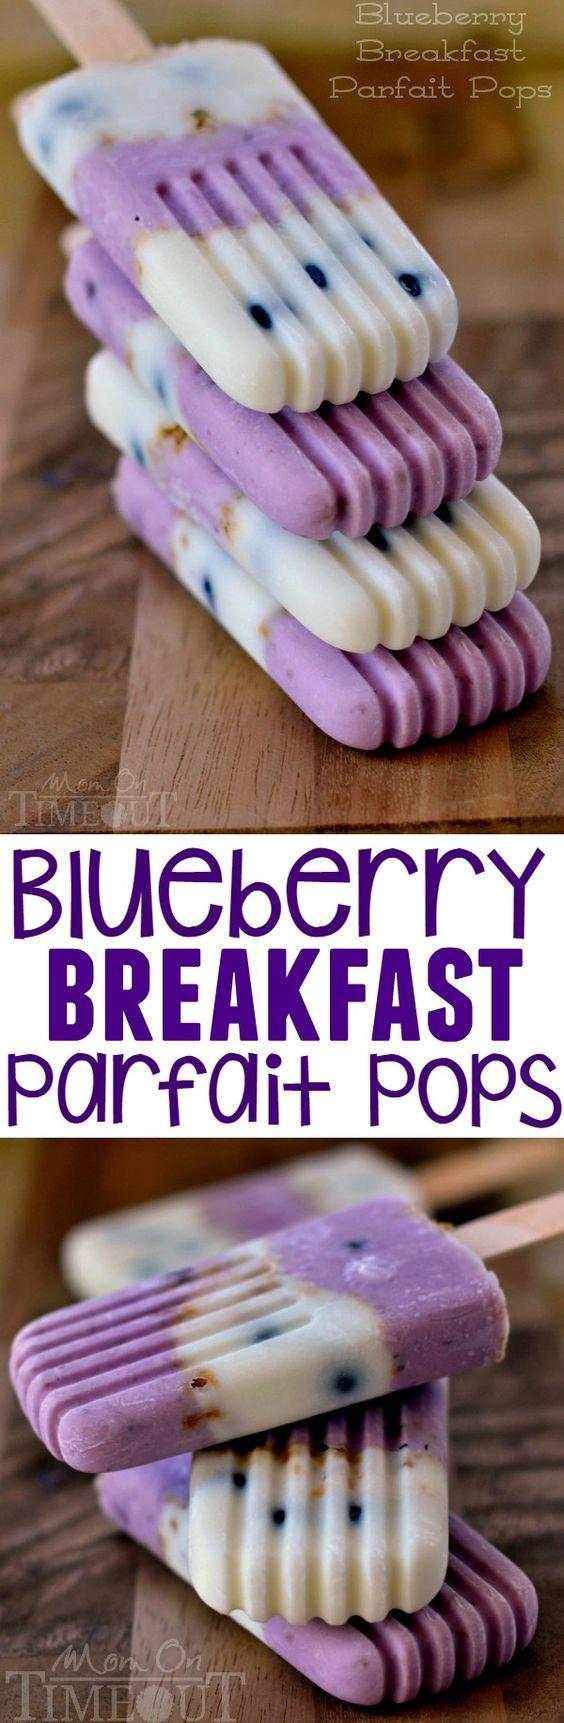 Popsicles for breakfast? You bet! Blueberry Breakfast Parfait Pops ...